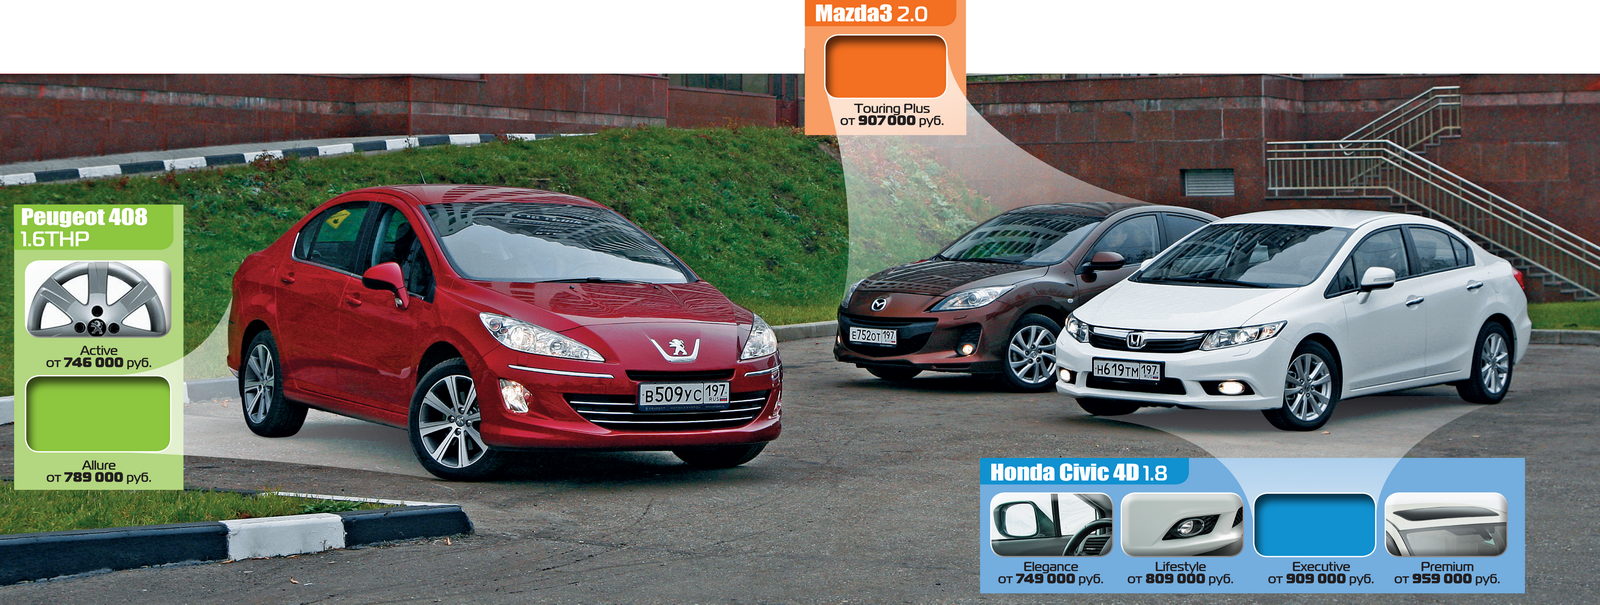 Peugeot 408, Mazda3и Honda Civic